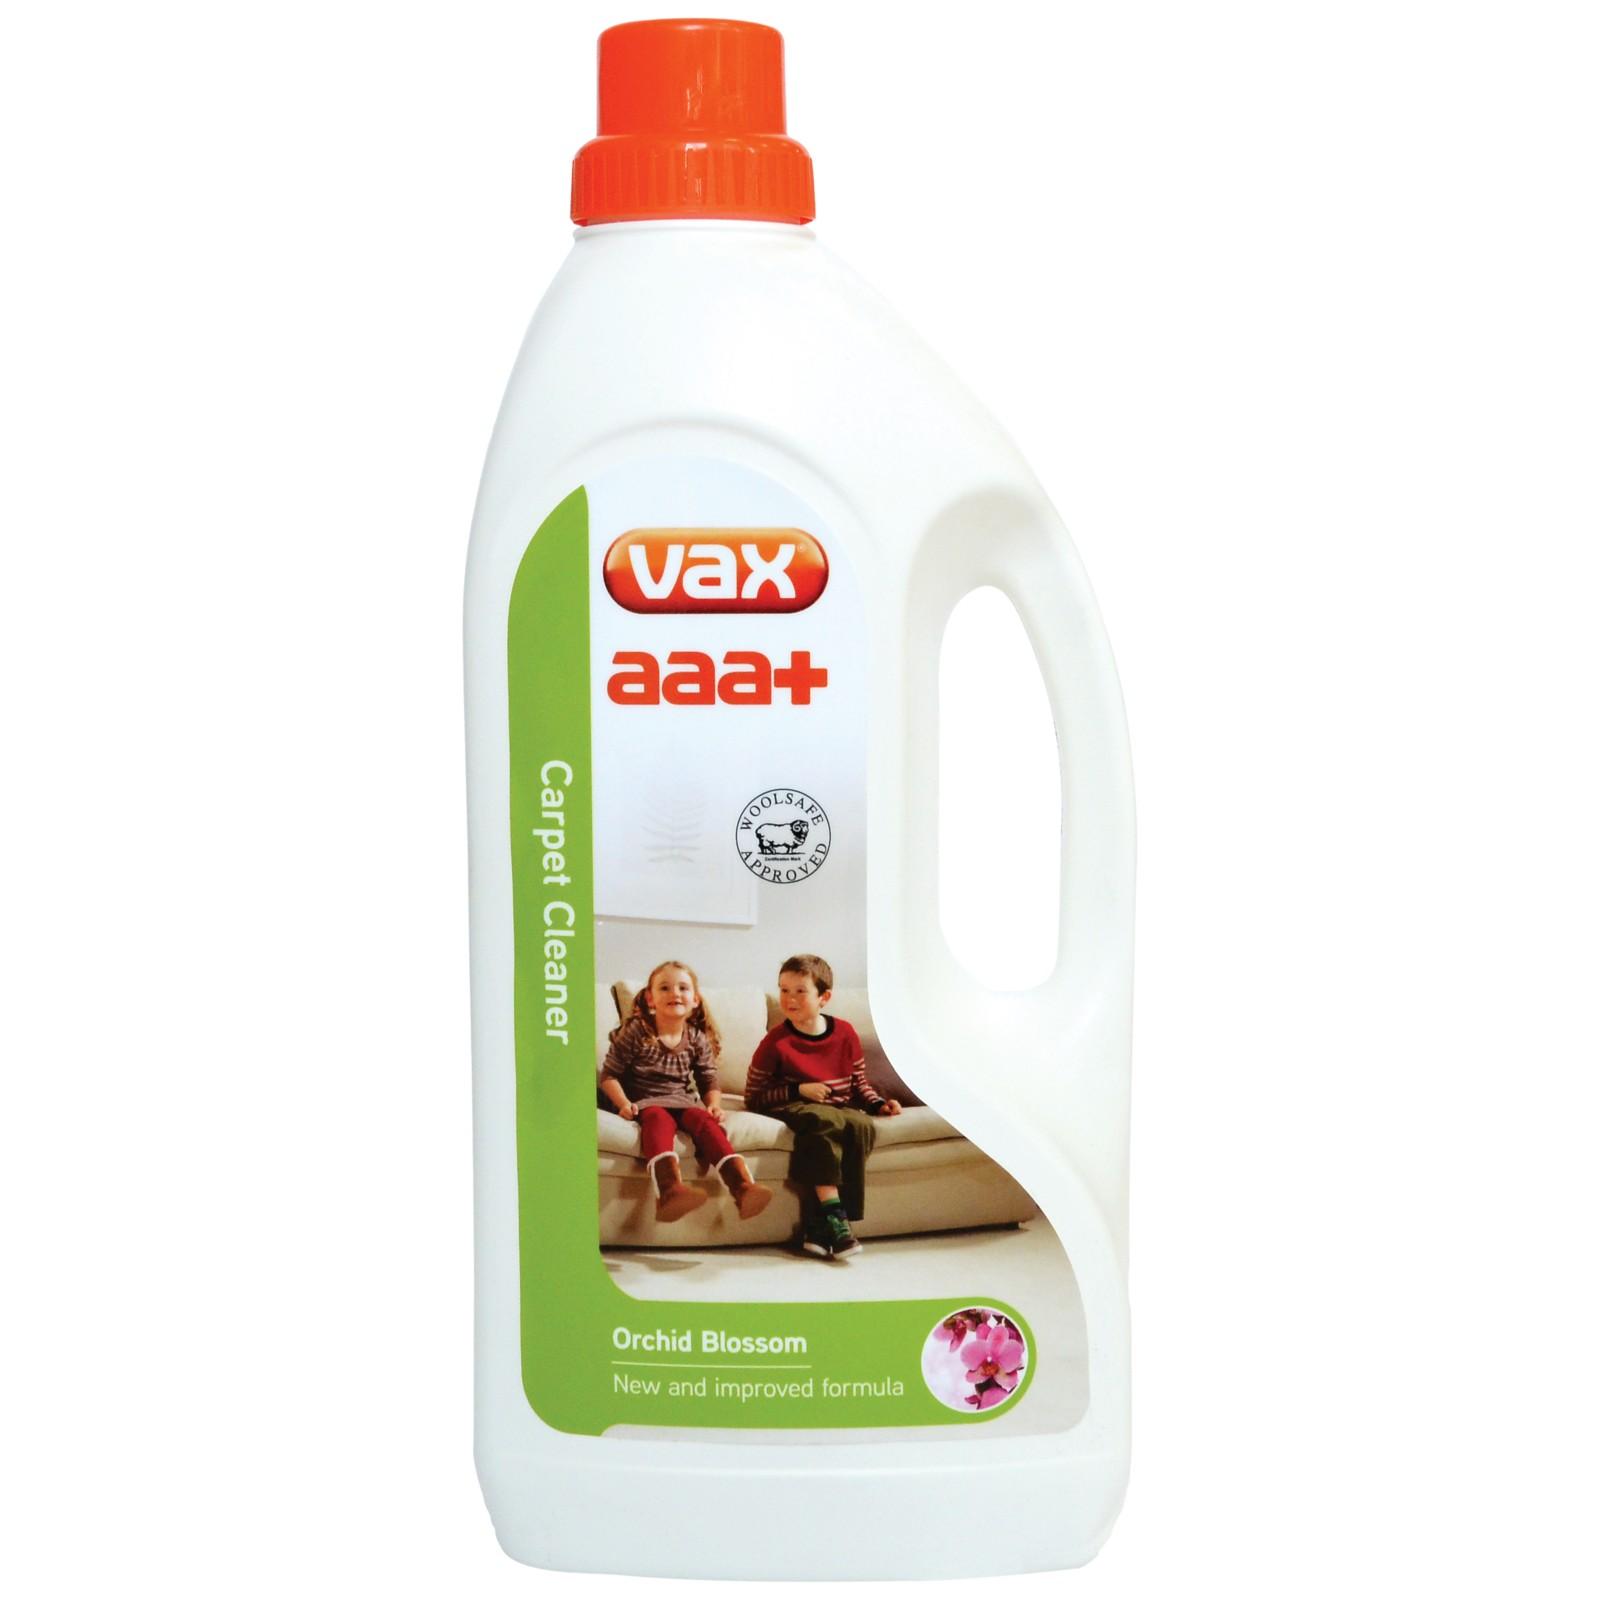 Vax AAA+ Standard Carpet Cleaner